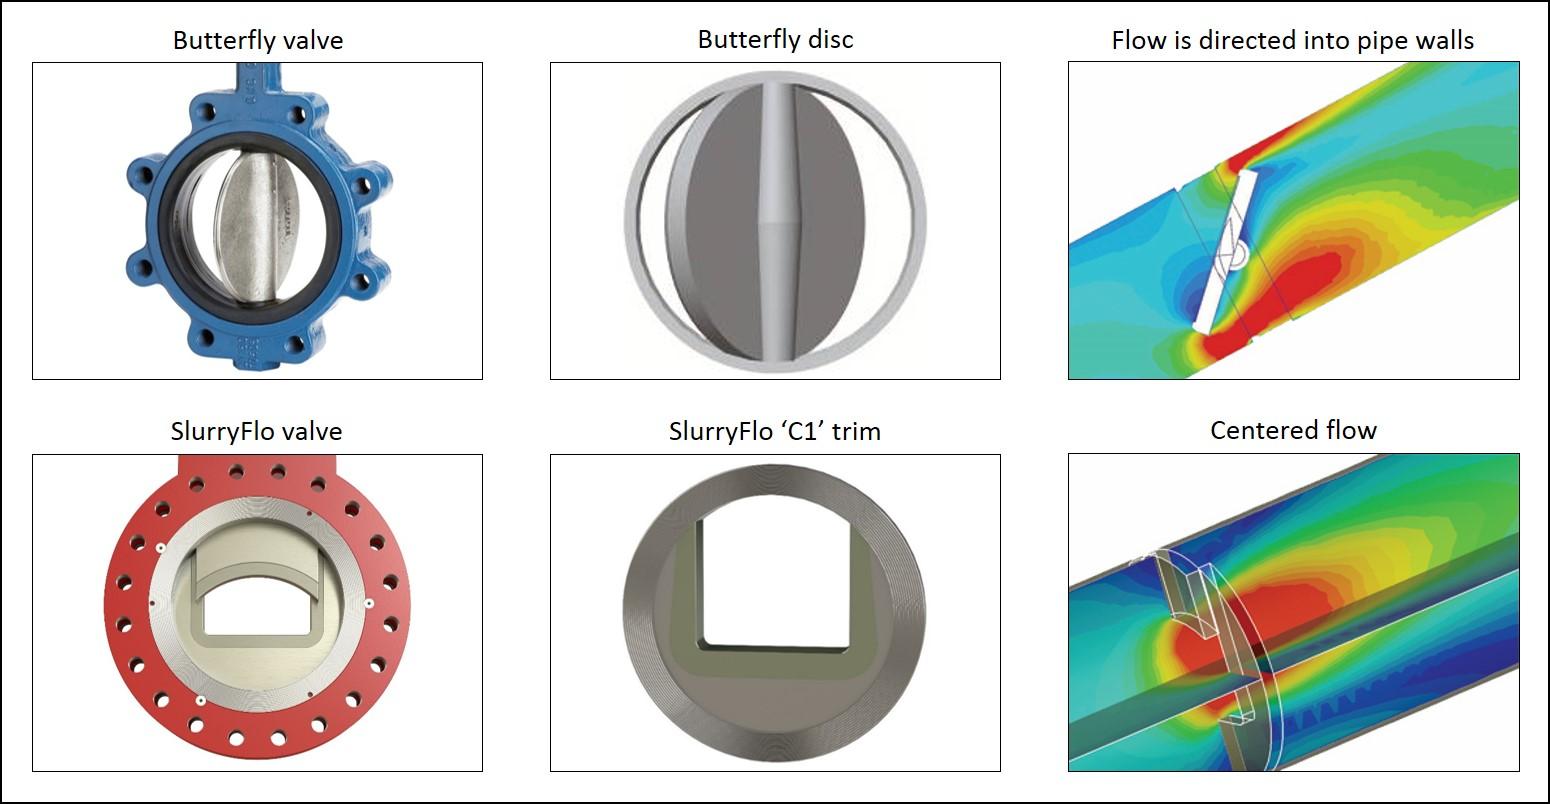 SlurryFlo control valve vs butterfly valve